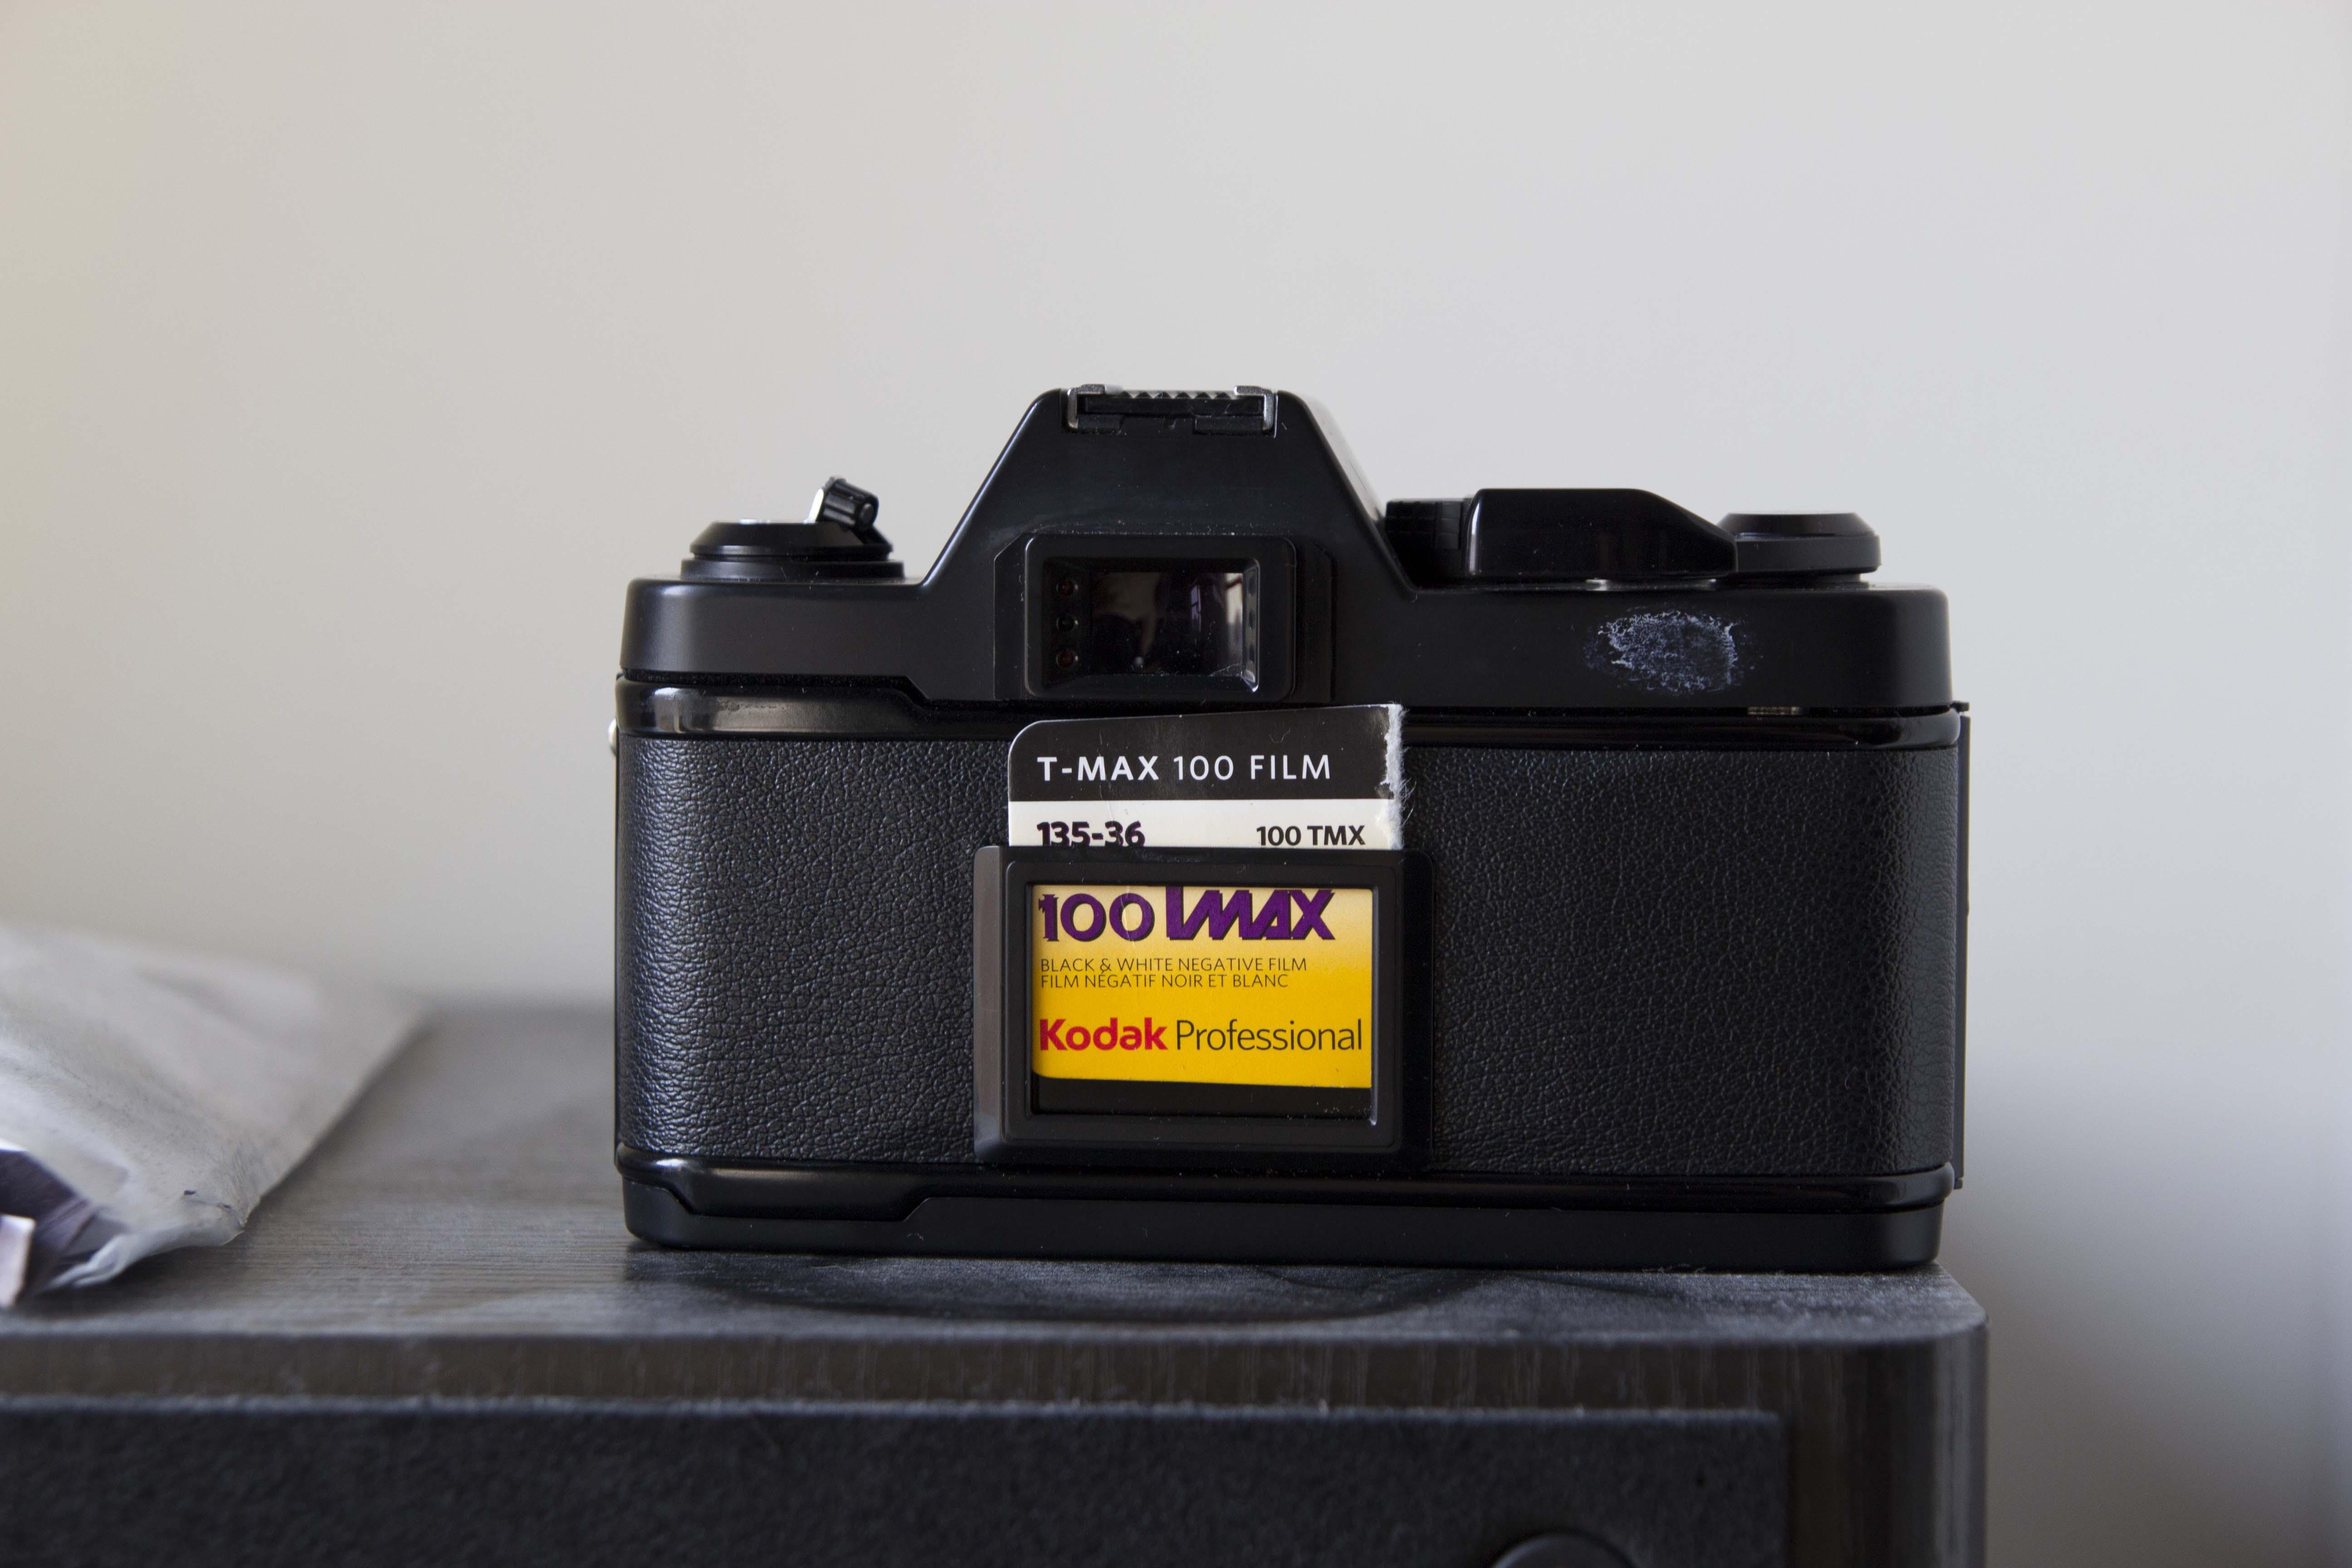 Tamron 17 50 F28 So Blurry Third Party Lens Talk Forum Digital Sp 50mm F 28 Xr Di Ii Ld Aspherical If Canon Eos View Original Size